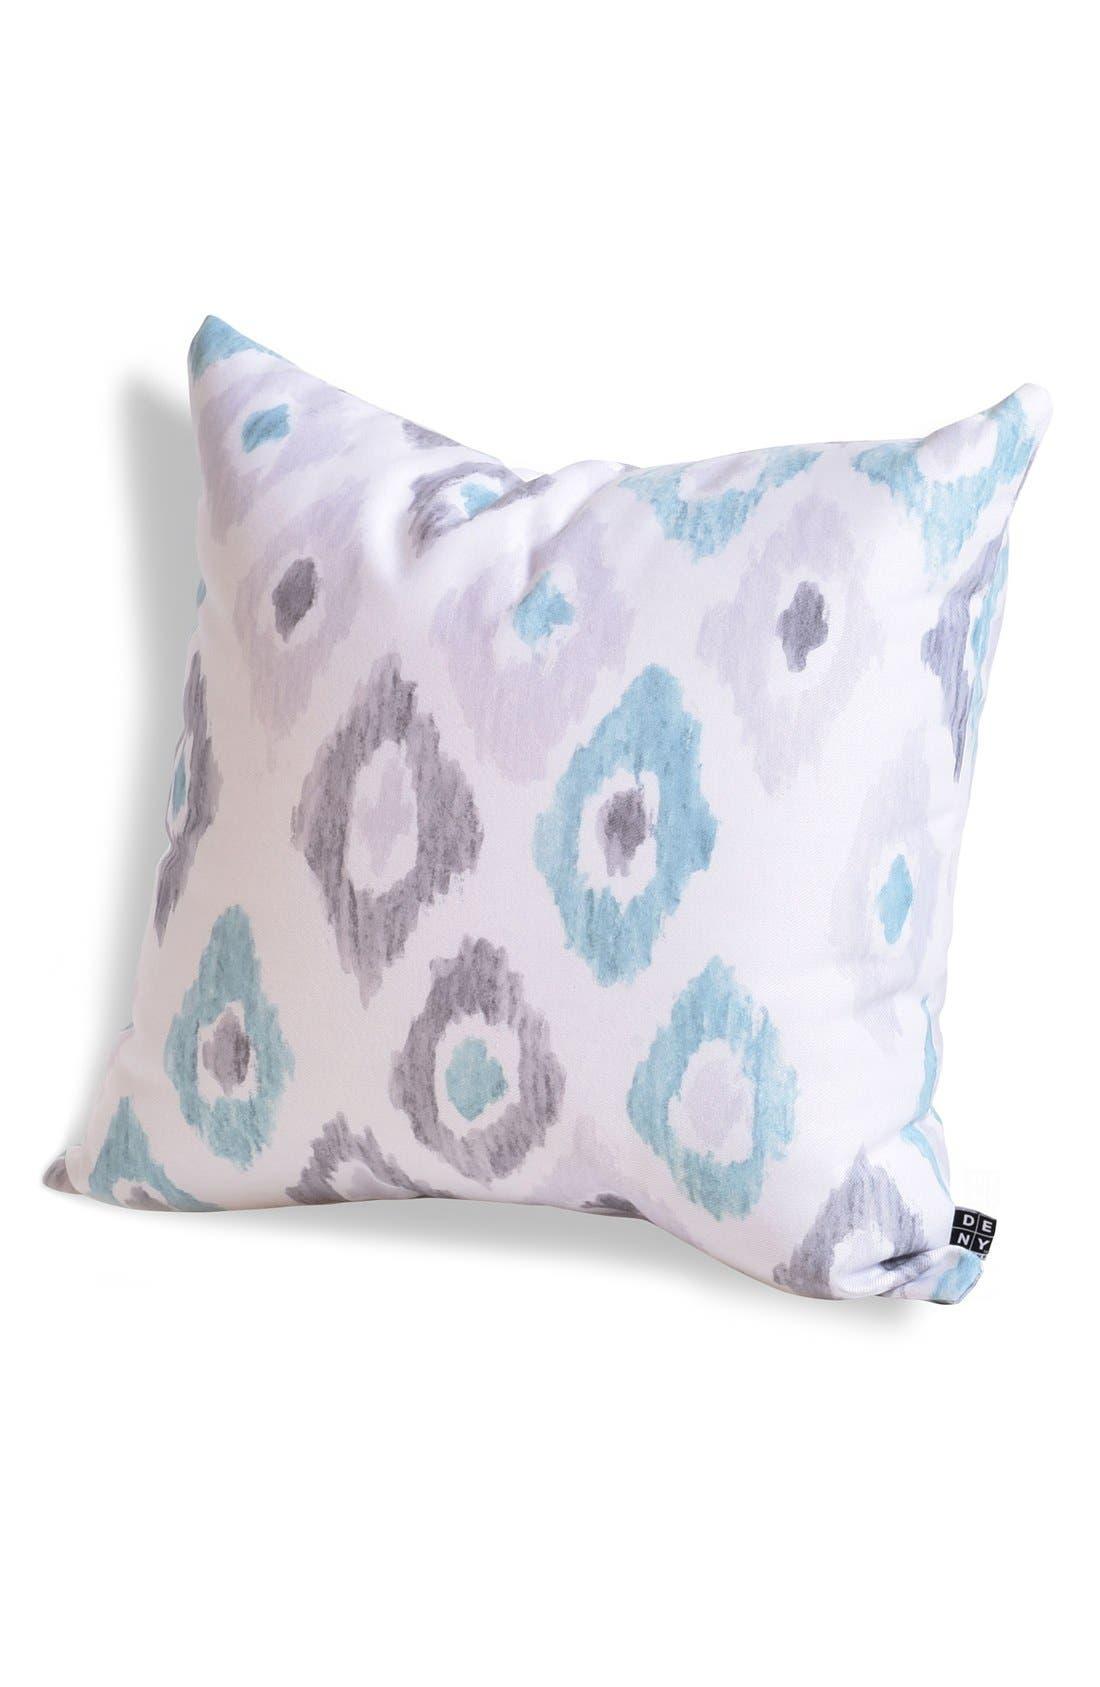 Alternate Image 1 Selected - Deny Designs 'Social Proper Ikat' Pillow